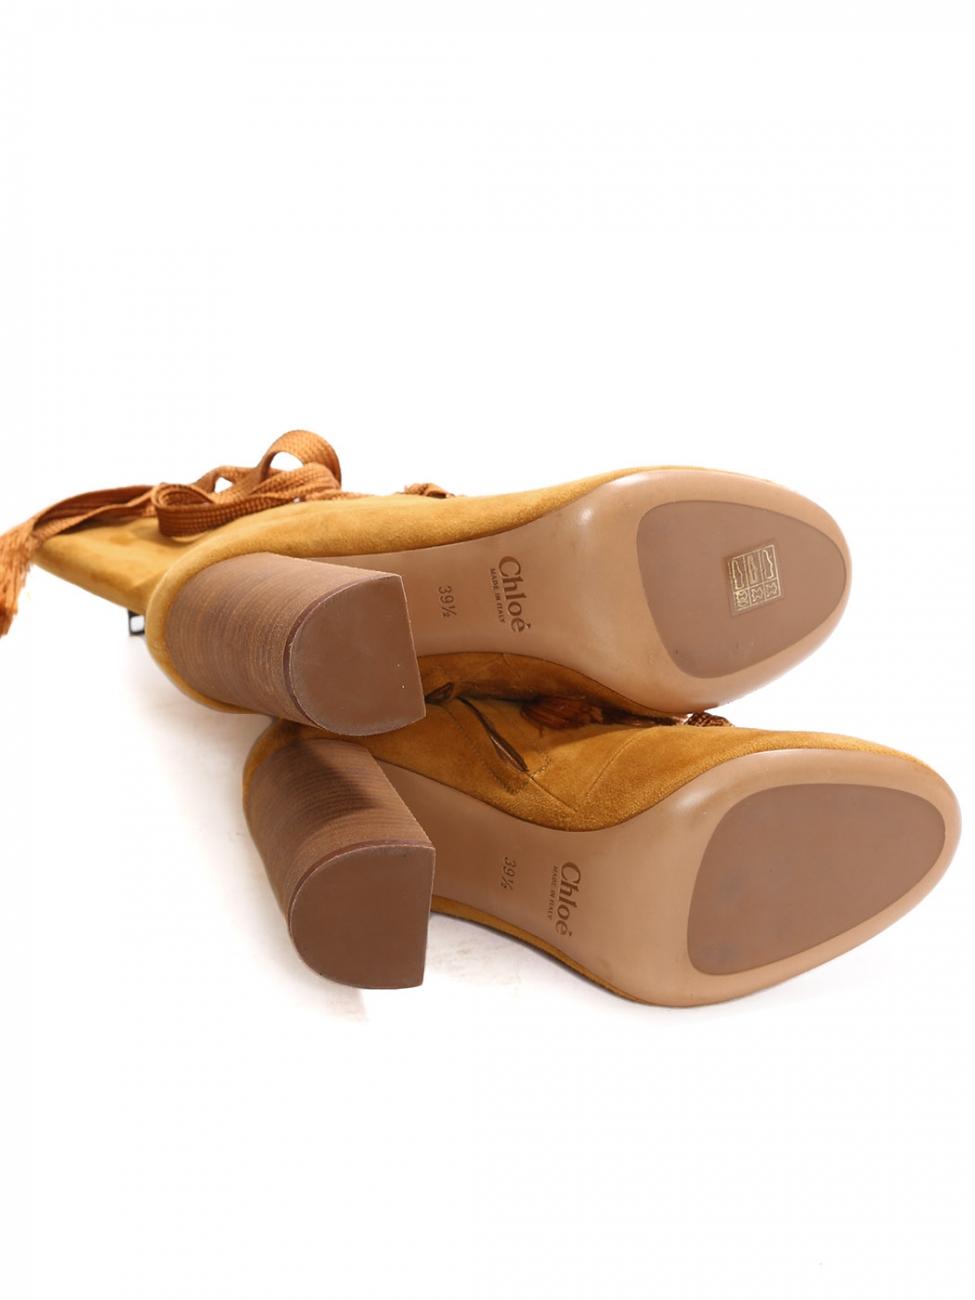 565a321ab5 Louise Paris - CHLOE HARPER Tan brown suede leather wooden heel ...